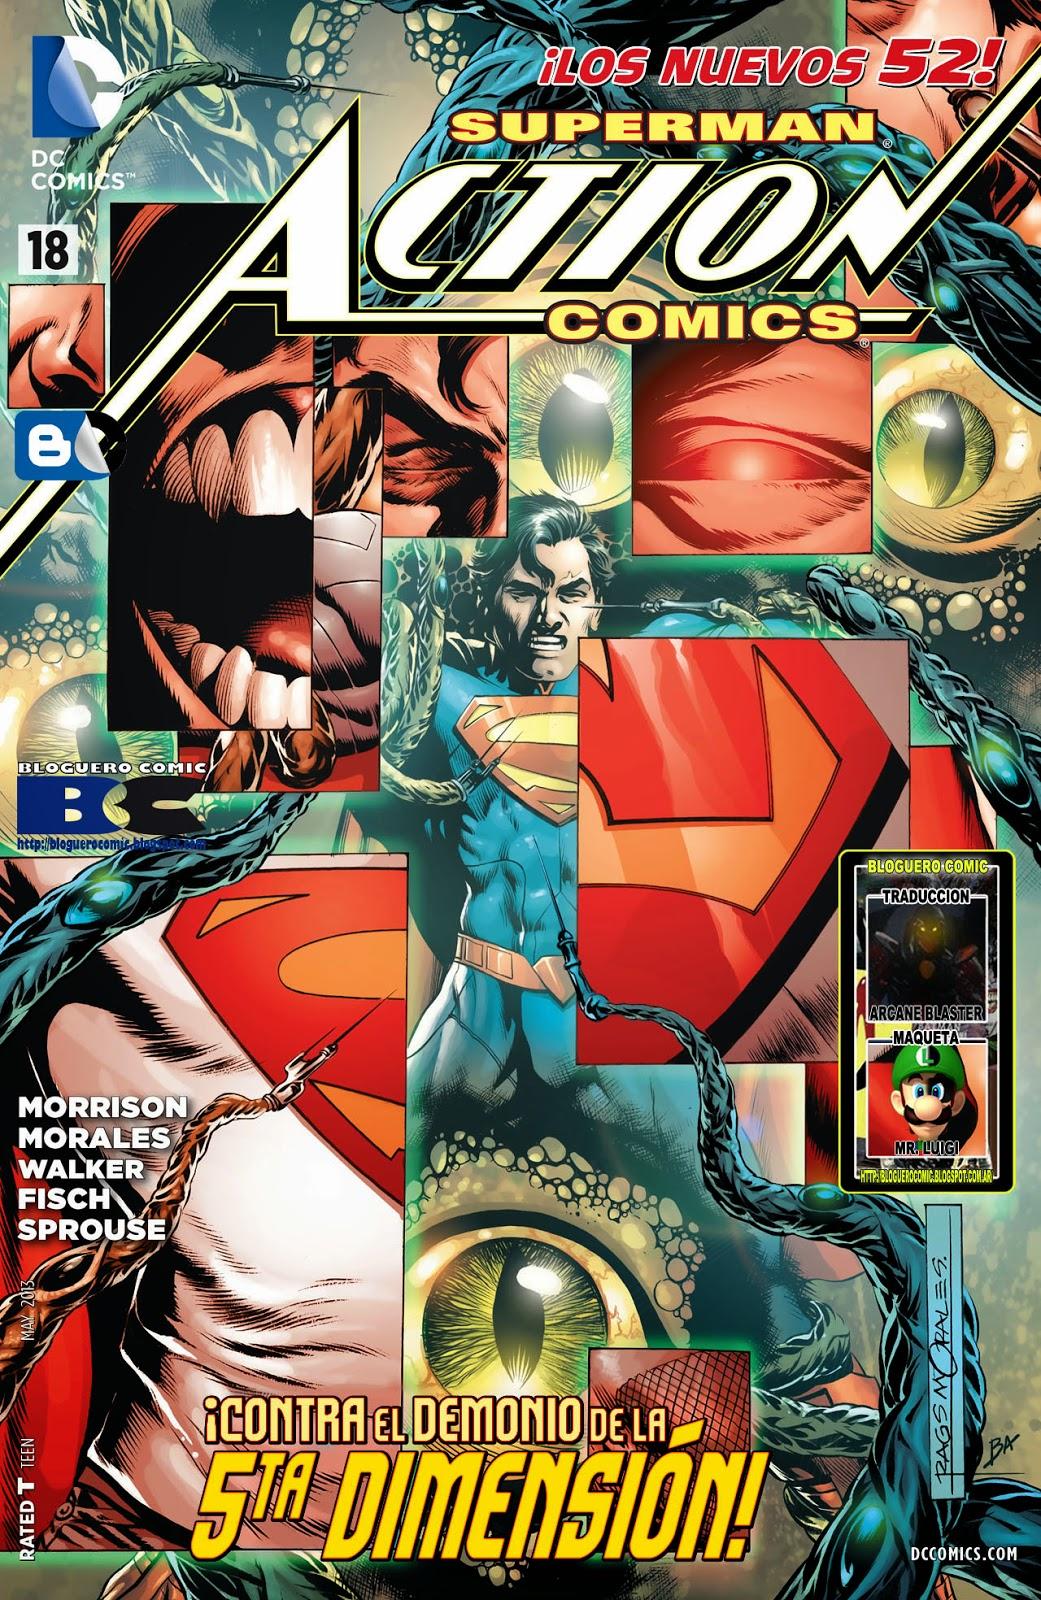 http://www.mediafire.com/download/5ukmmx5w8572h3c/Action+Comics+18+%28Bloguero+Arcane+Blaster-Mr.+Luigi%29.cbr